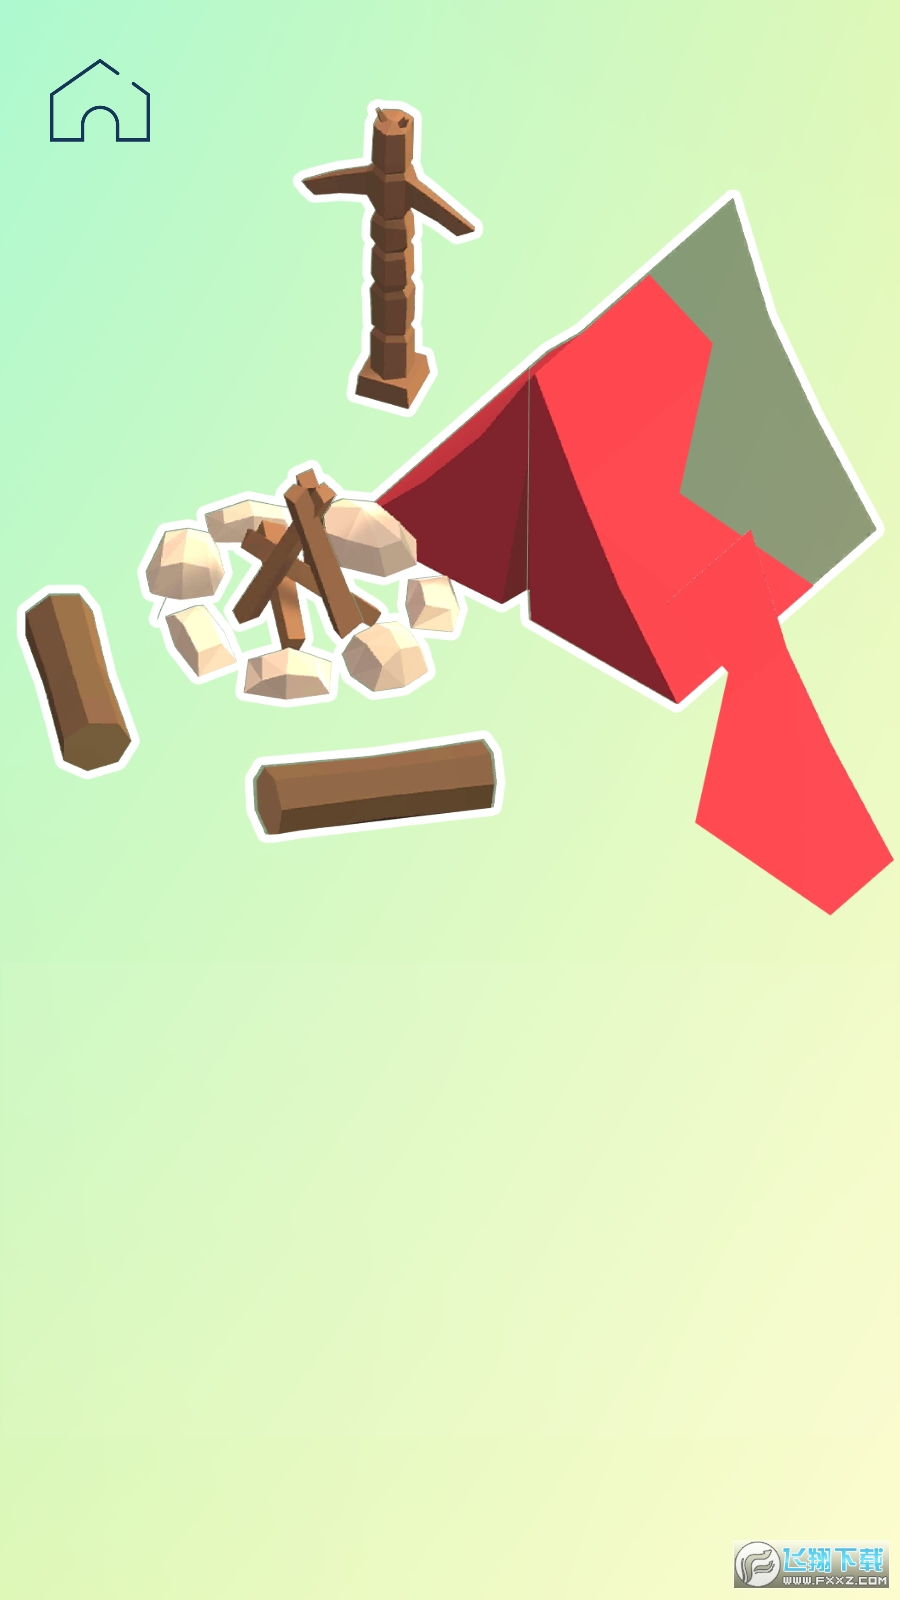 3D迷你世界拼图安卓版v8620212021最新菠菜论坛菠菜论坛版截图1